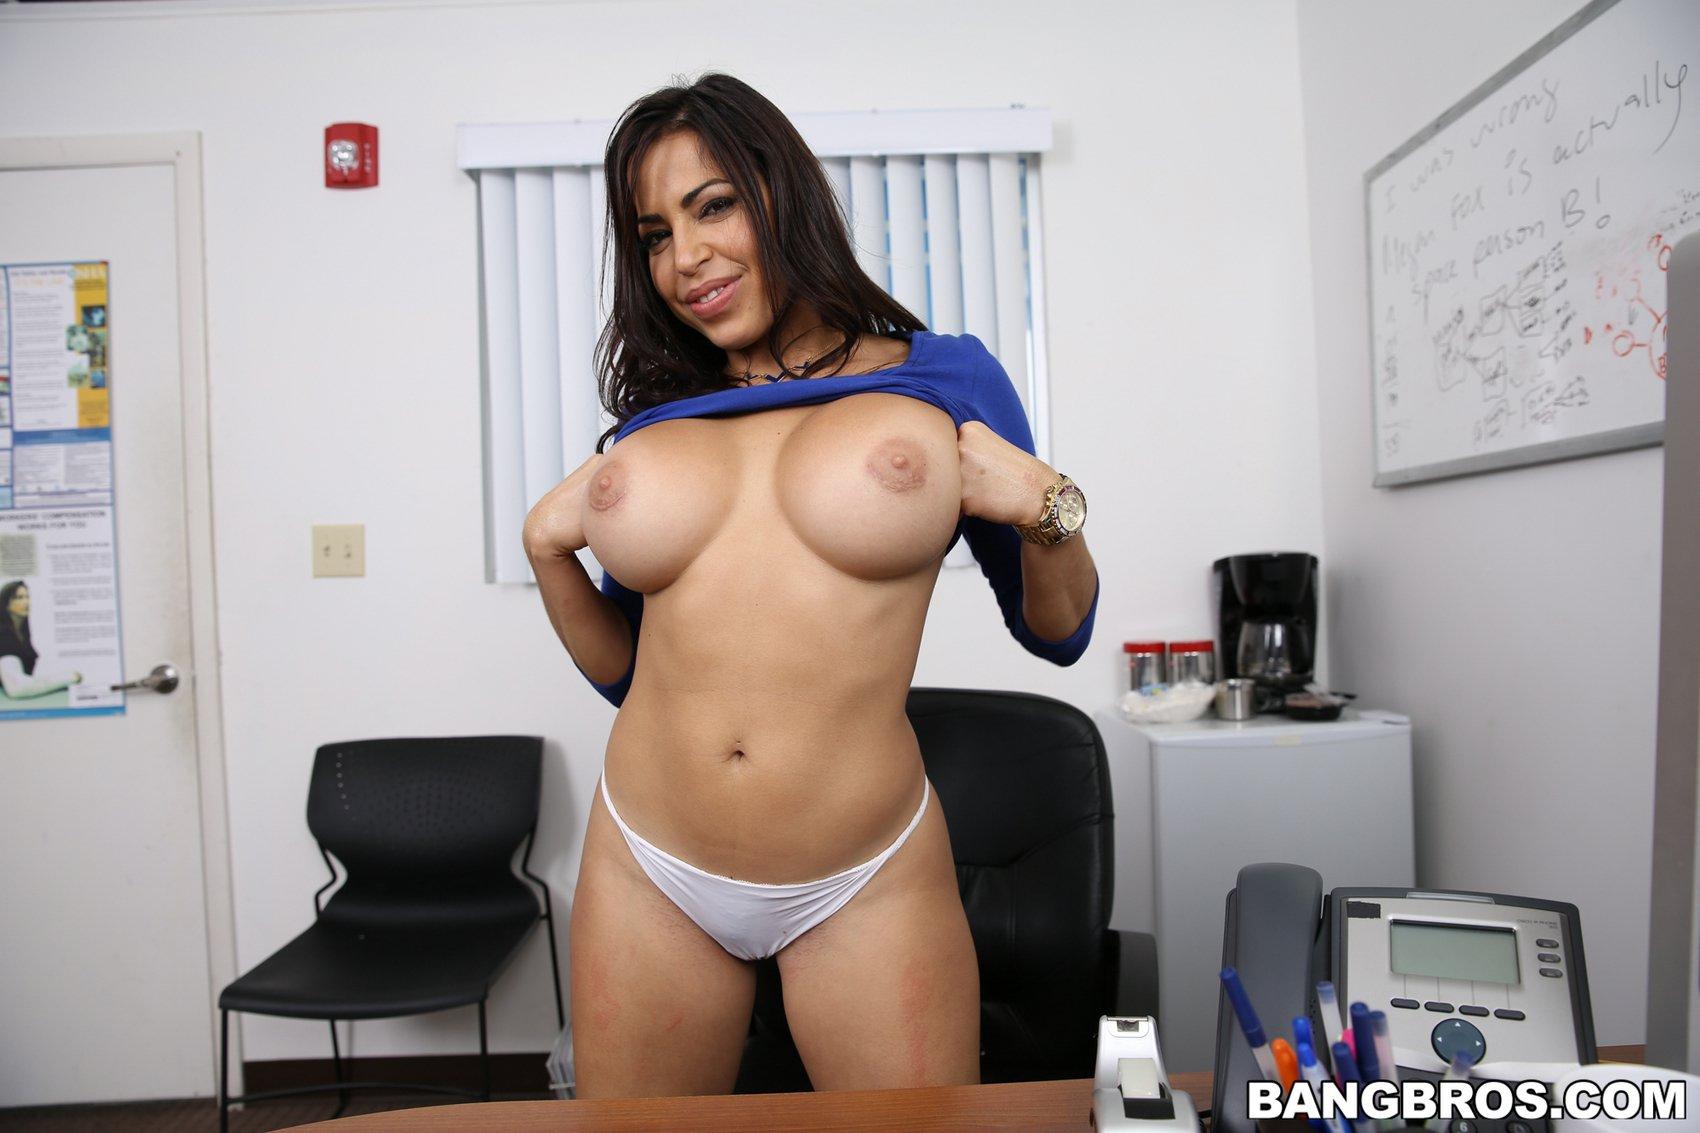 Julianna Vega shows off her sexy body in the office - My Pornstar Book: mypornstarbook.net/pornstars/j/julianna_vega/gallery10/mobile.php